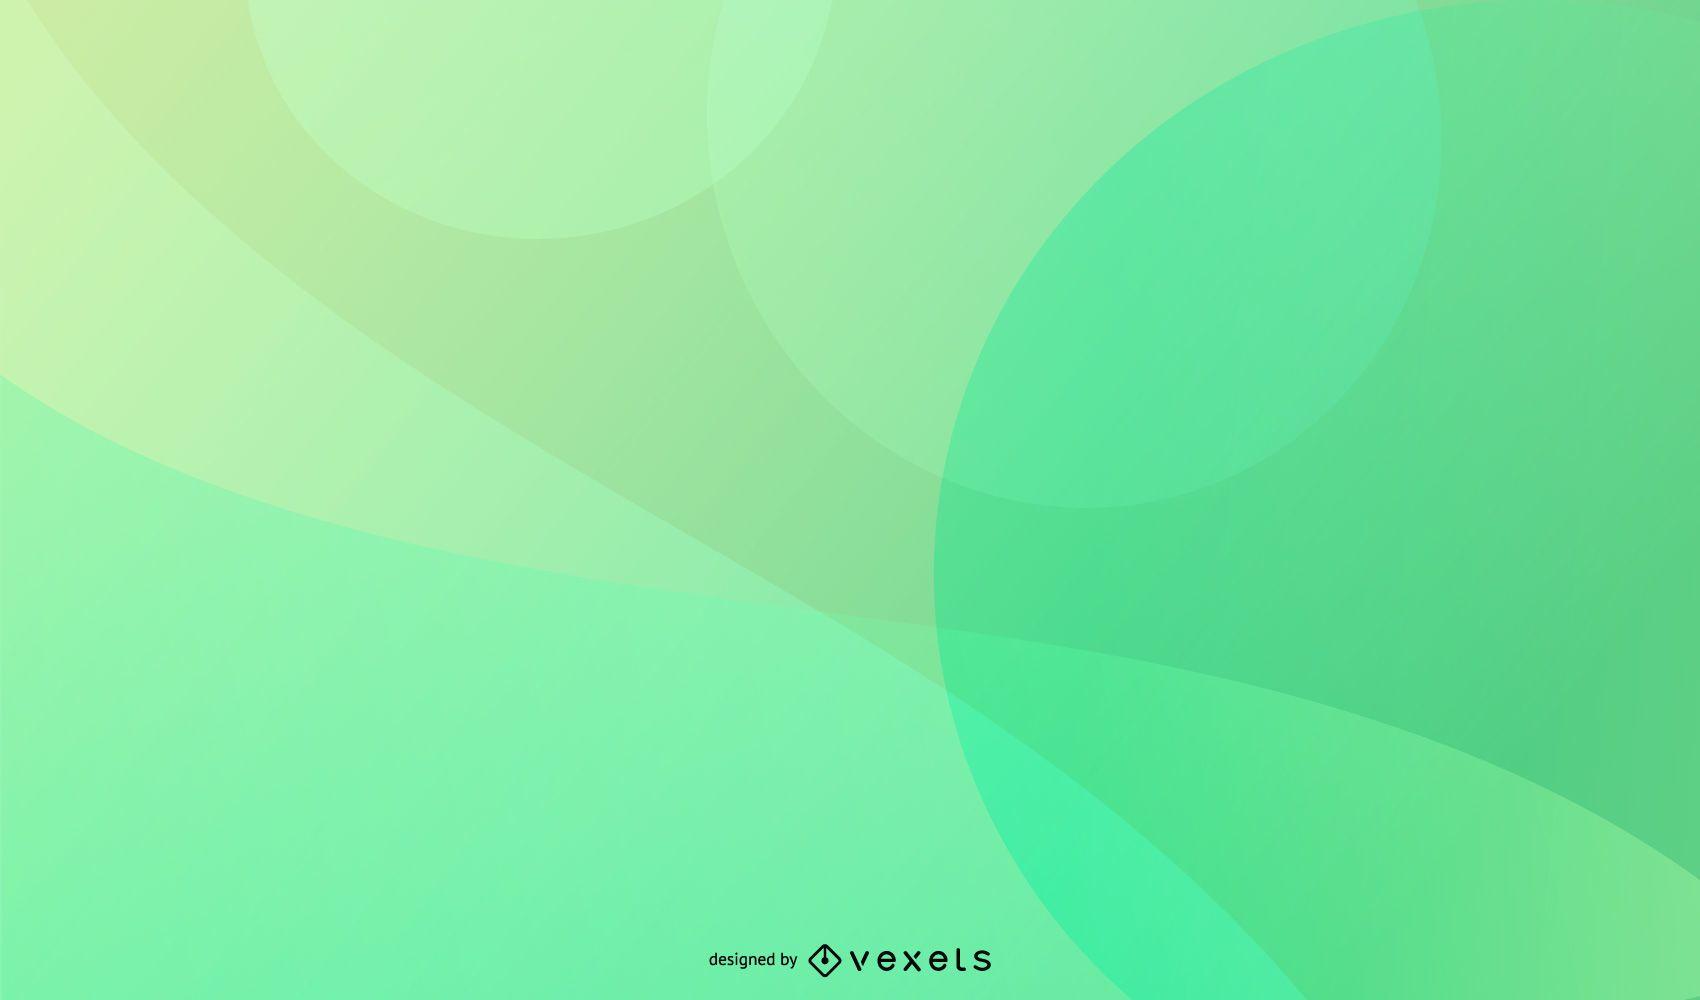 Soft green background design